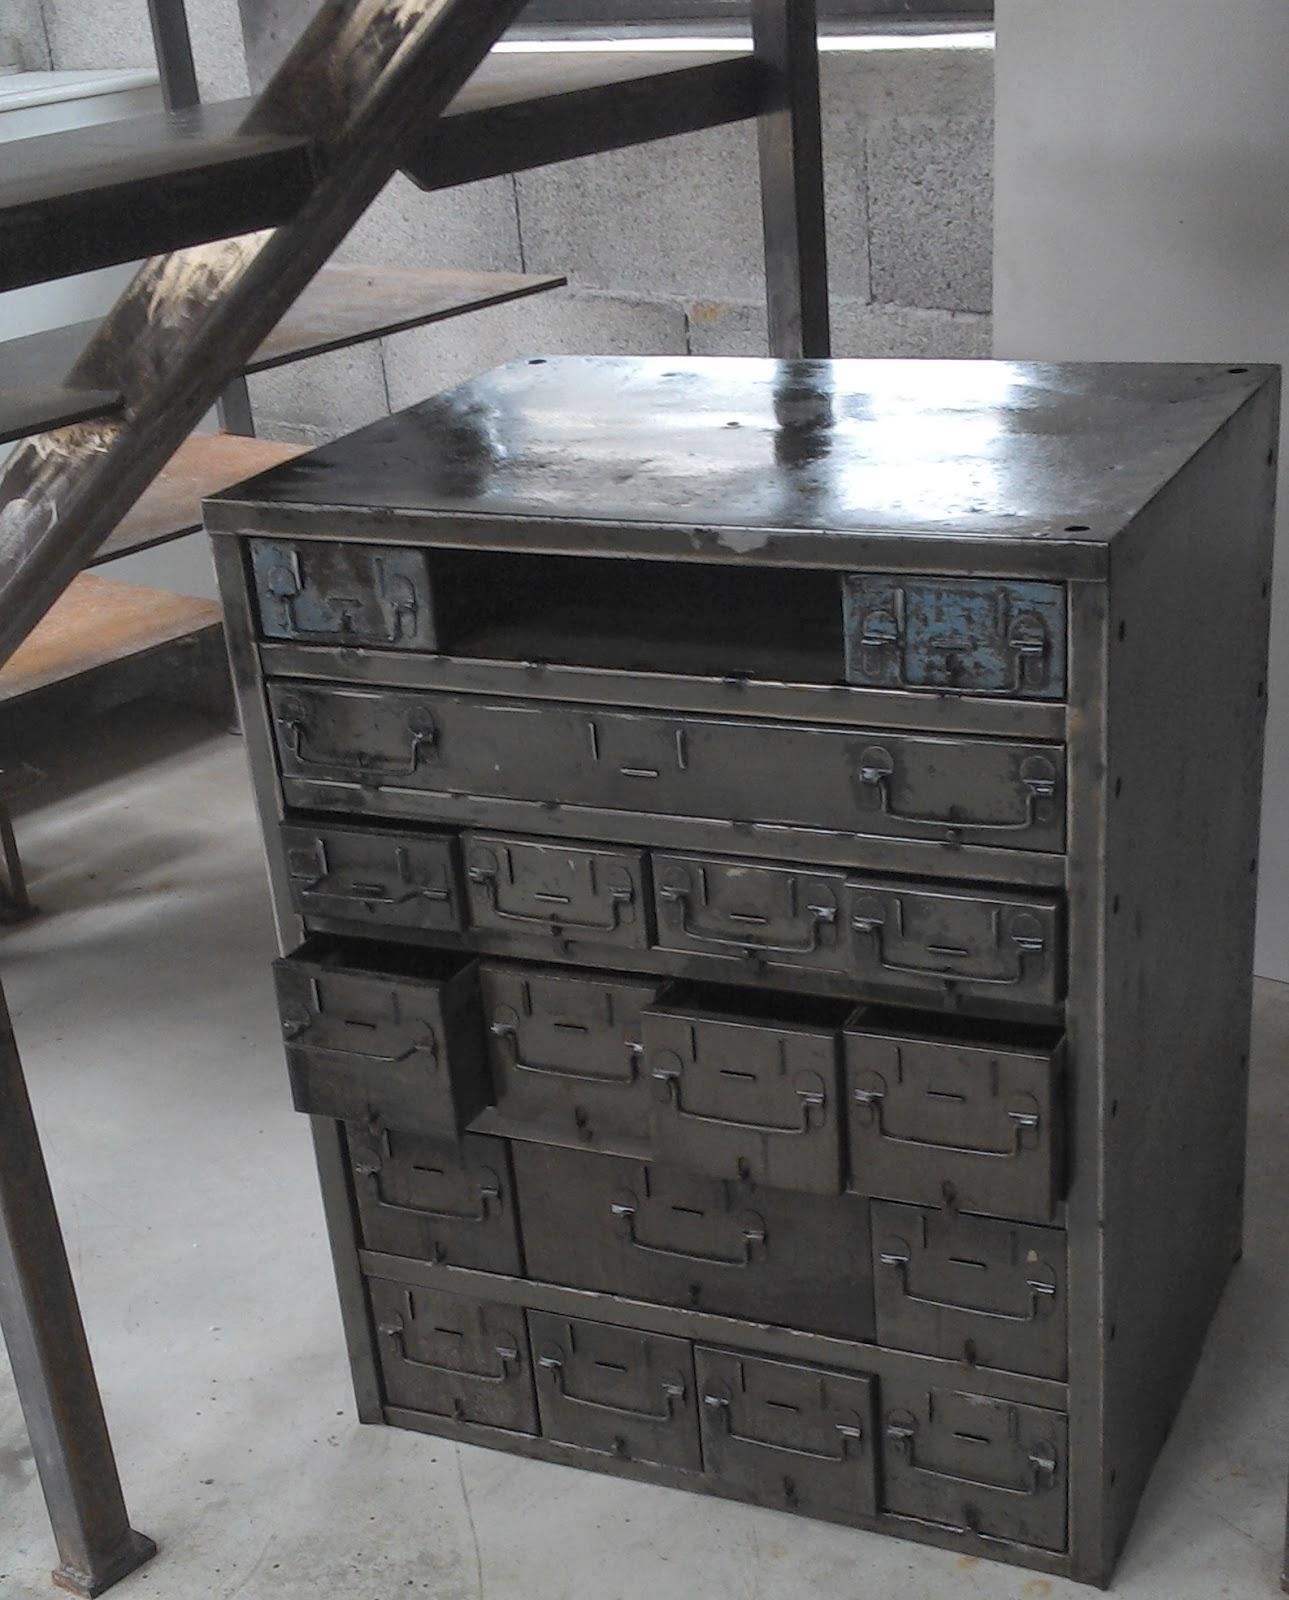 Meuble d 39 atelier a tiroir usine - Meuble loft industriel ...